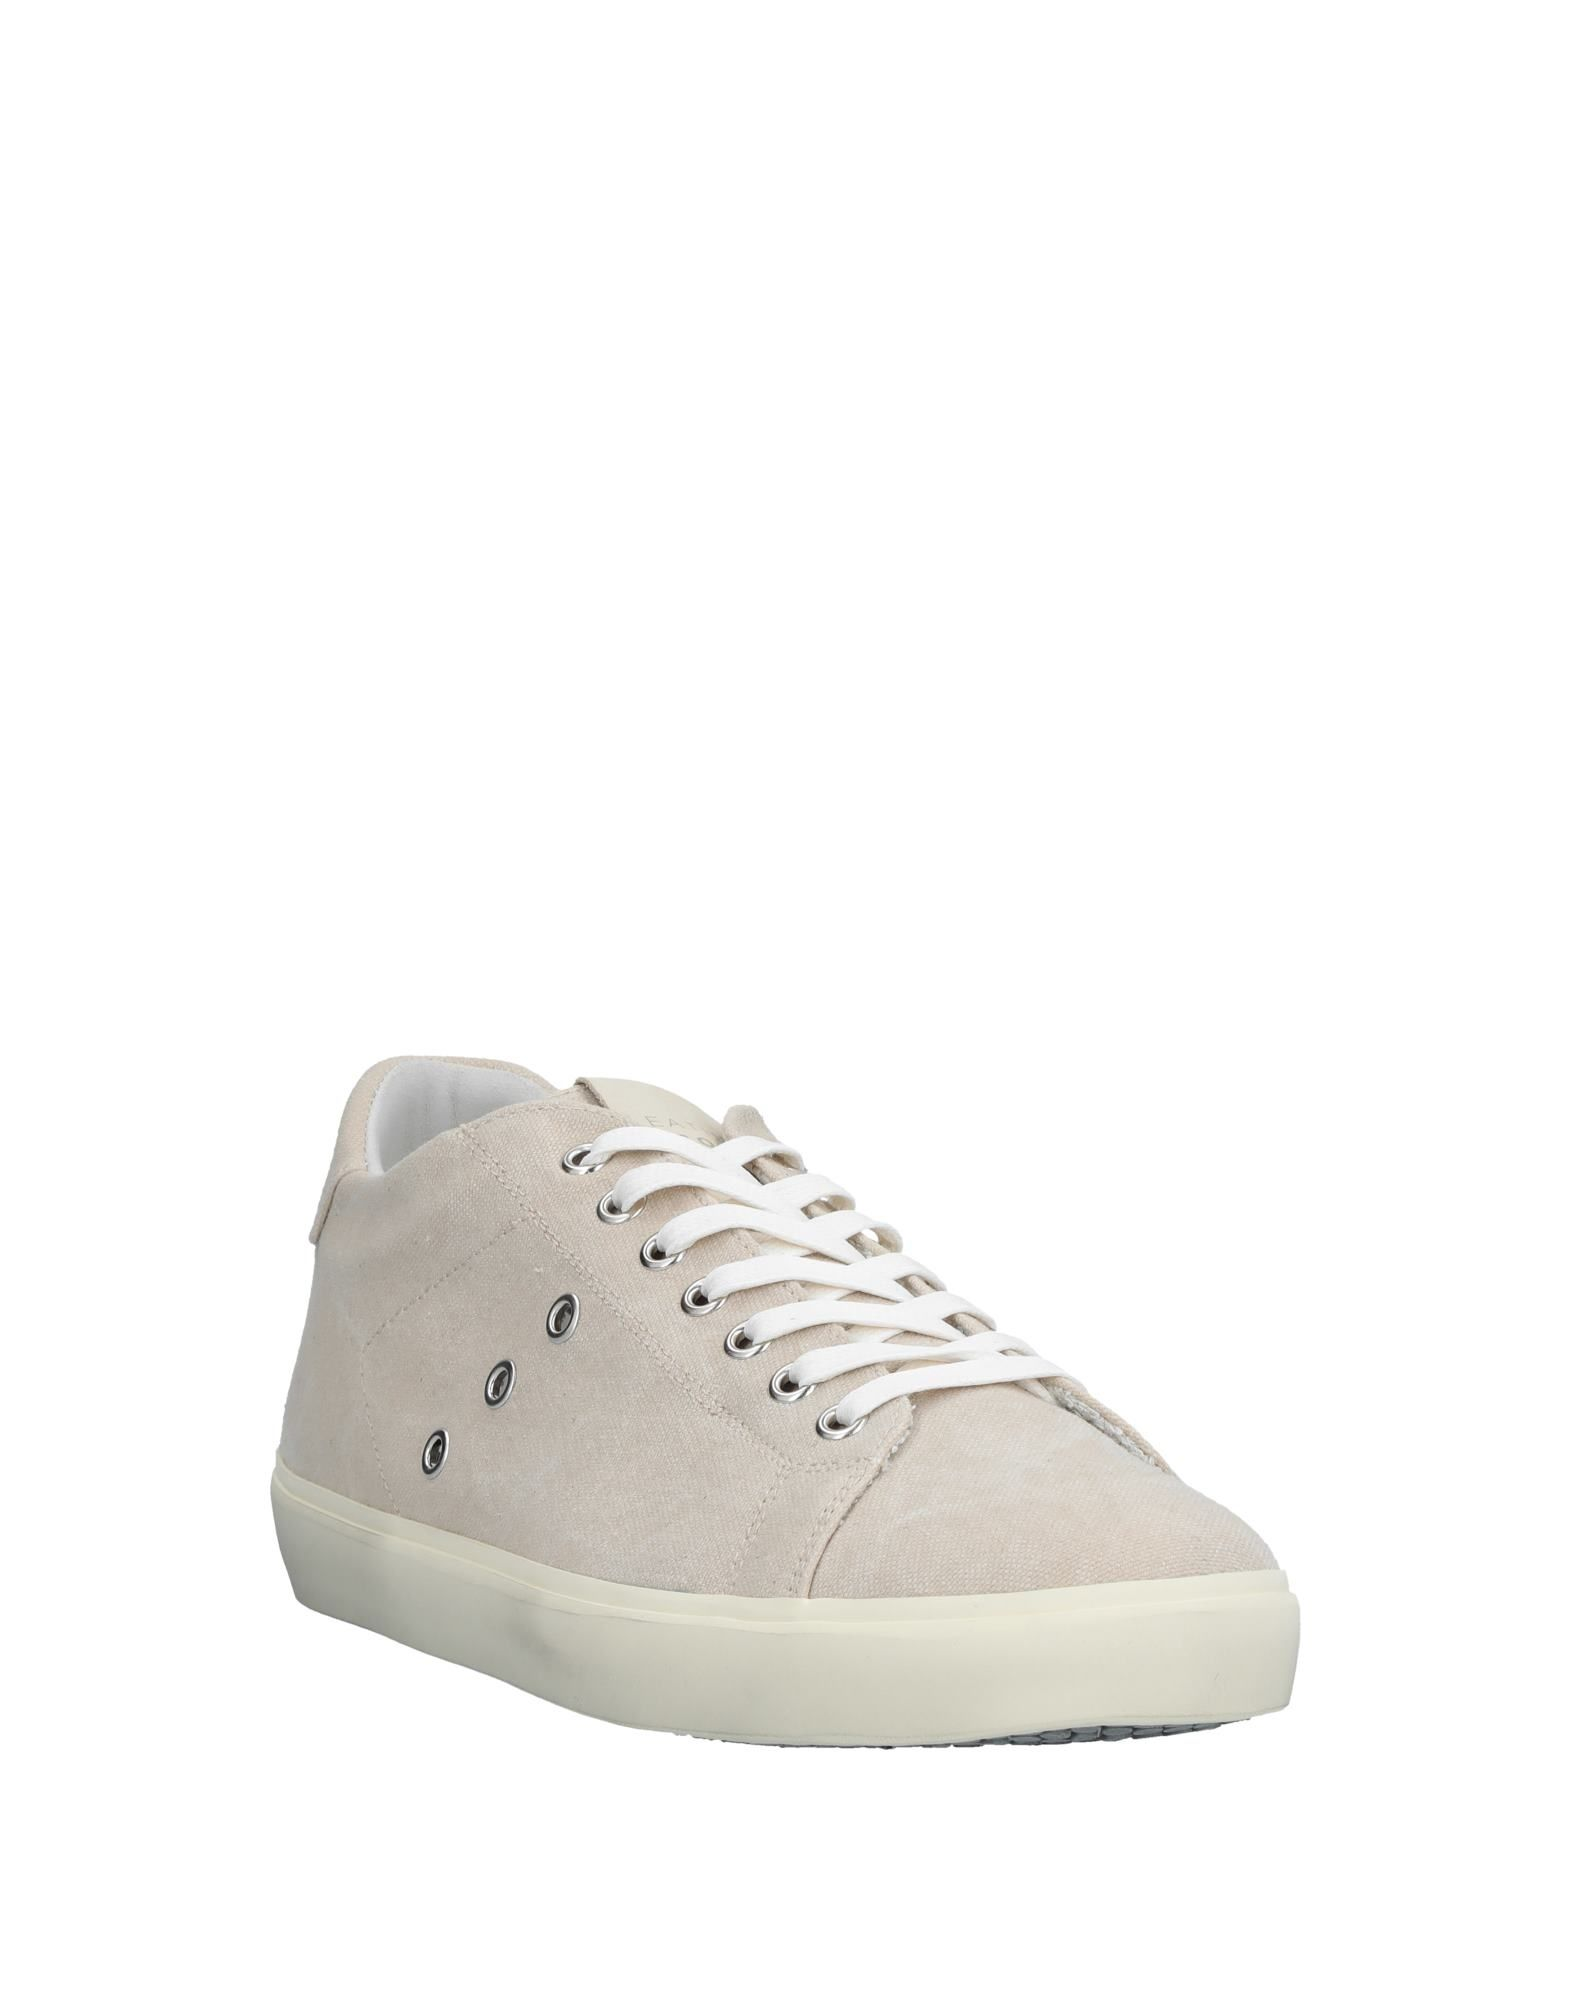 Rabatt echte Schuhe Turnschuhes Leder Crown Turnschuhes Schuhe Herren 11536652SI 62c3fb